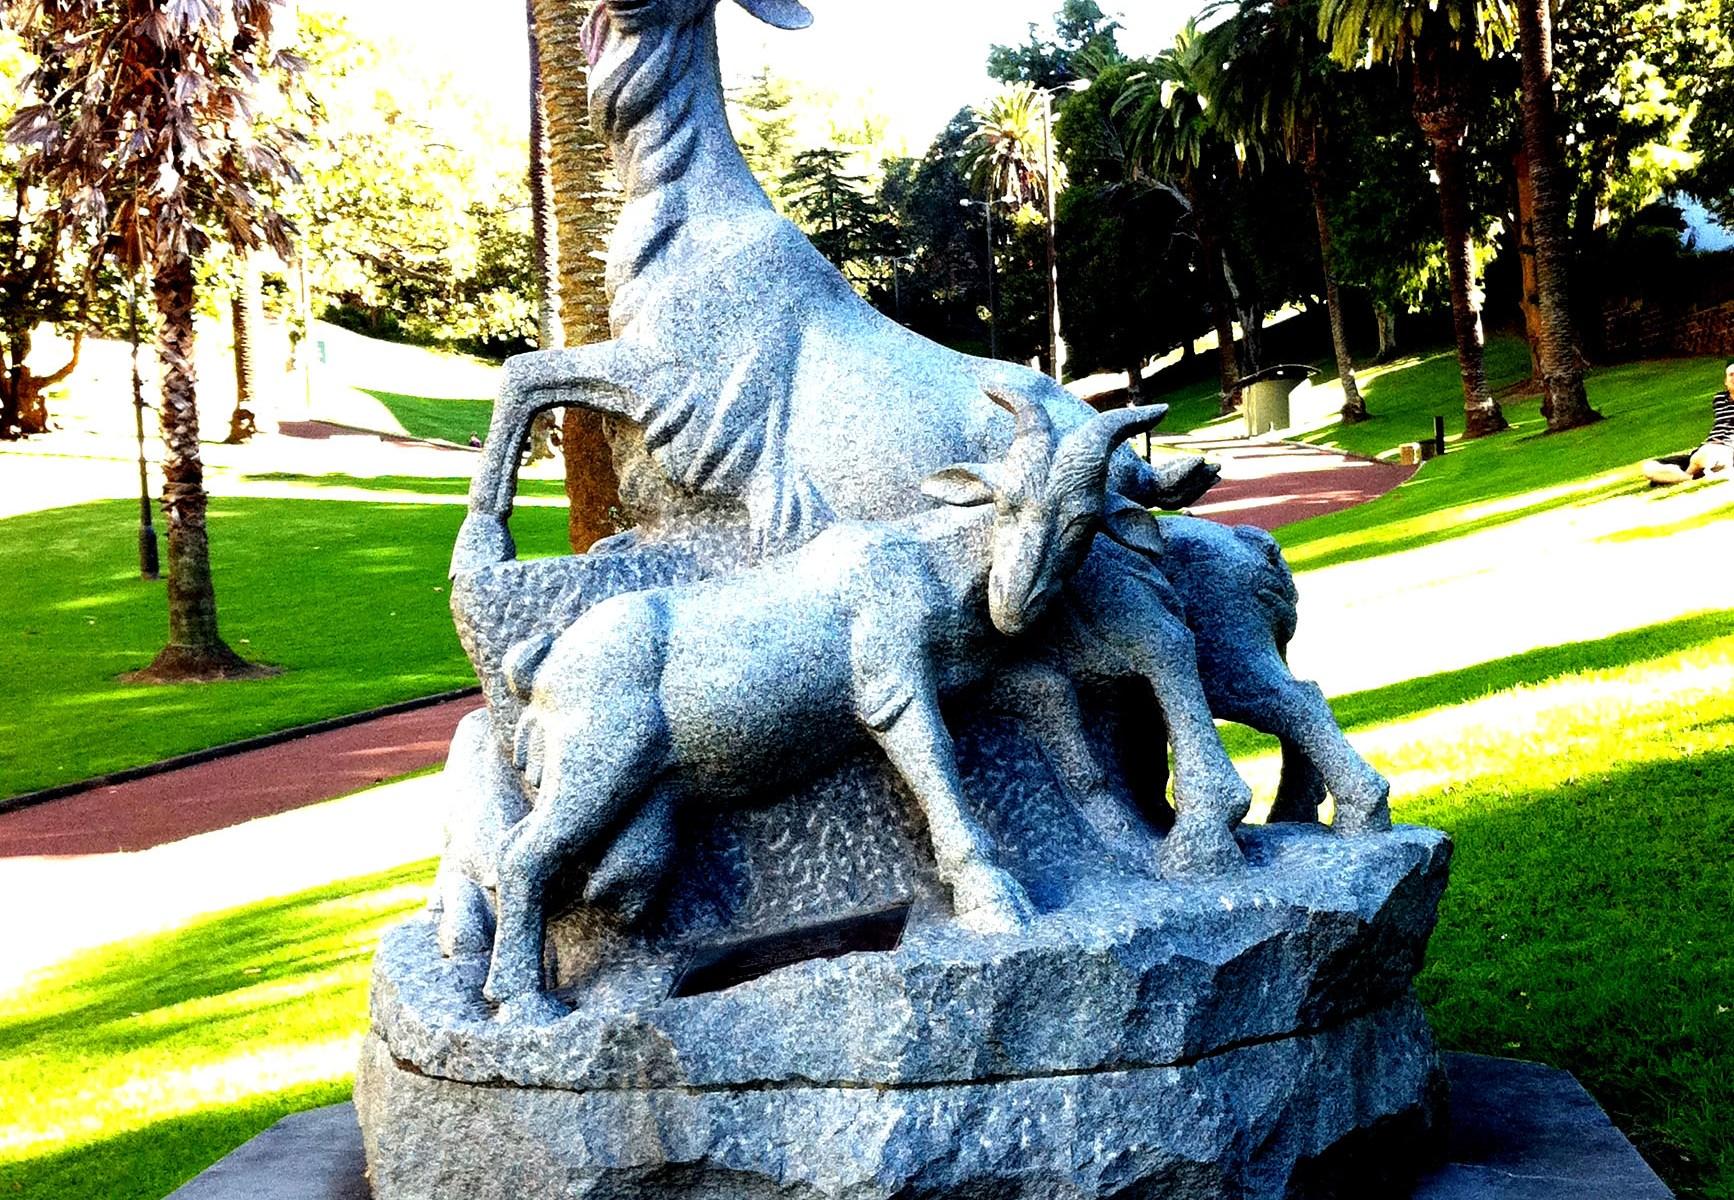 The Five Rams Sculpture Meyers Park